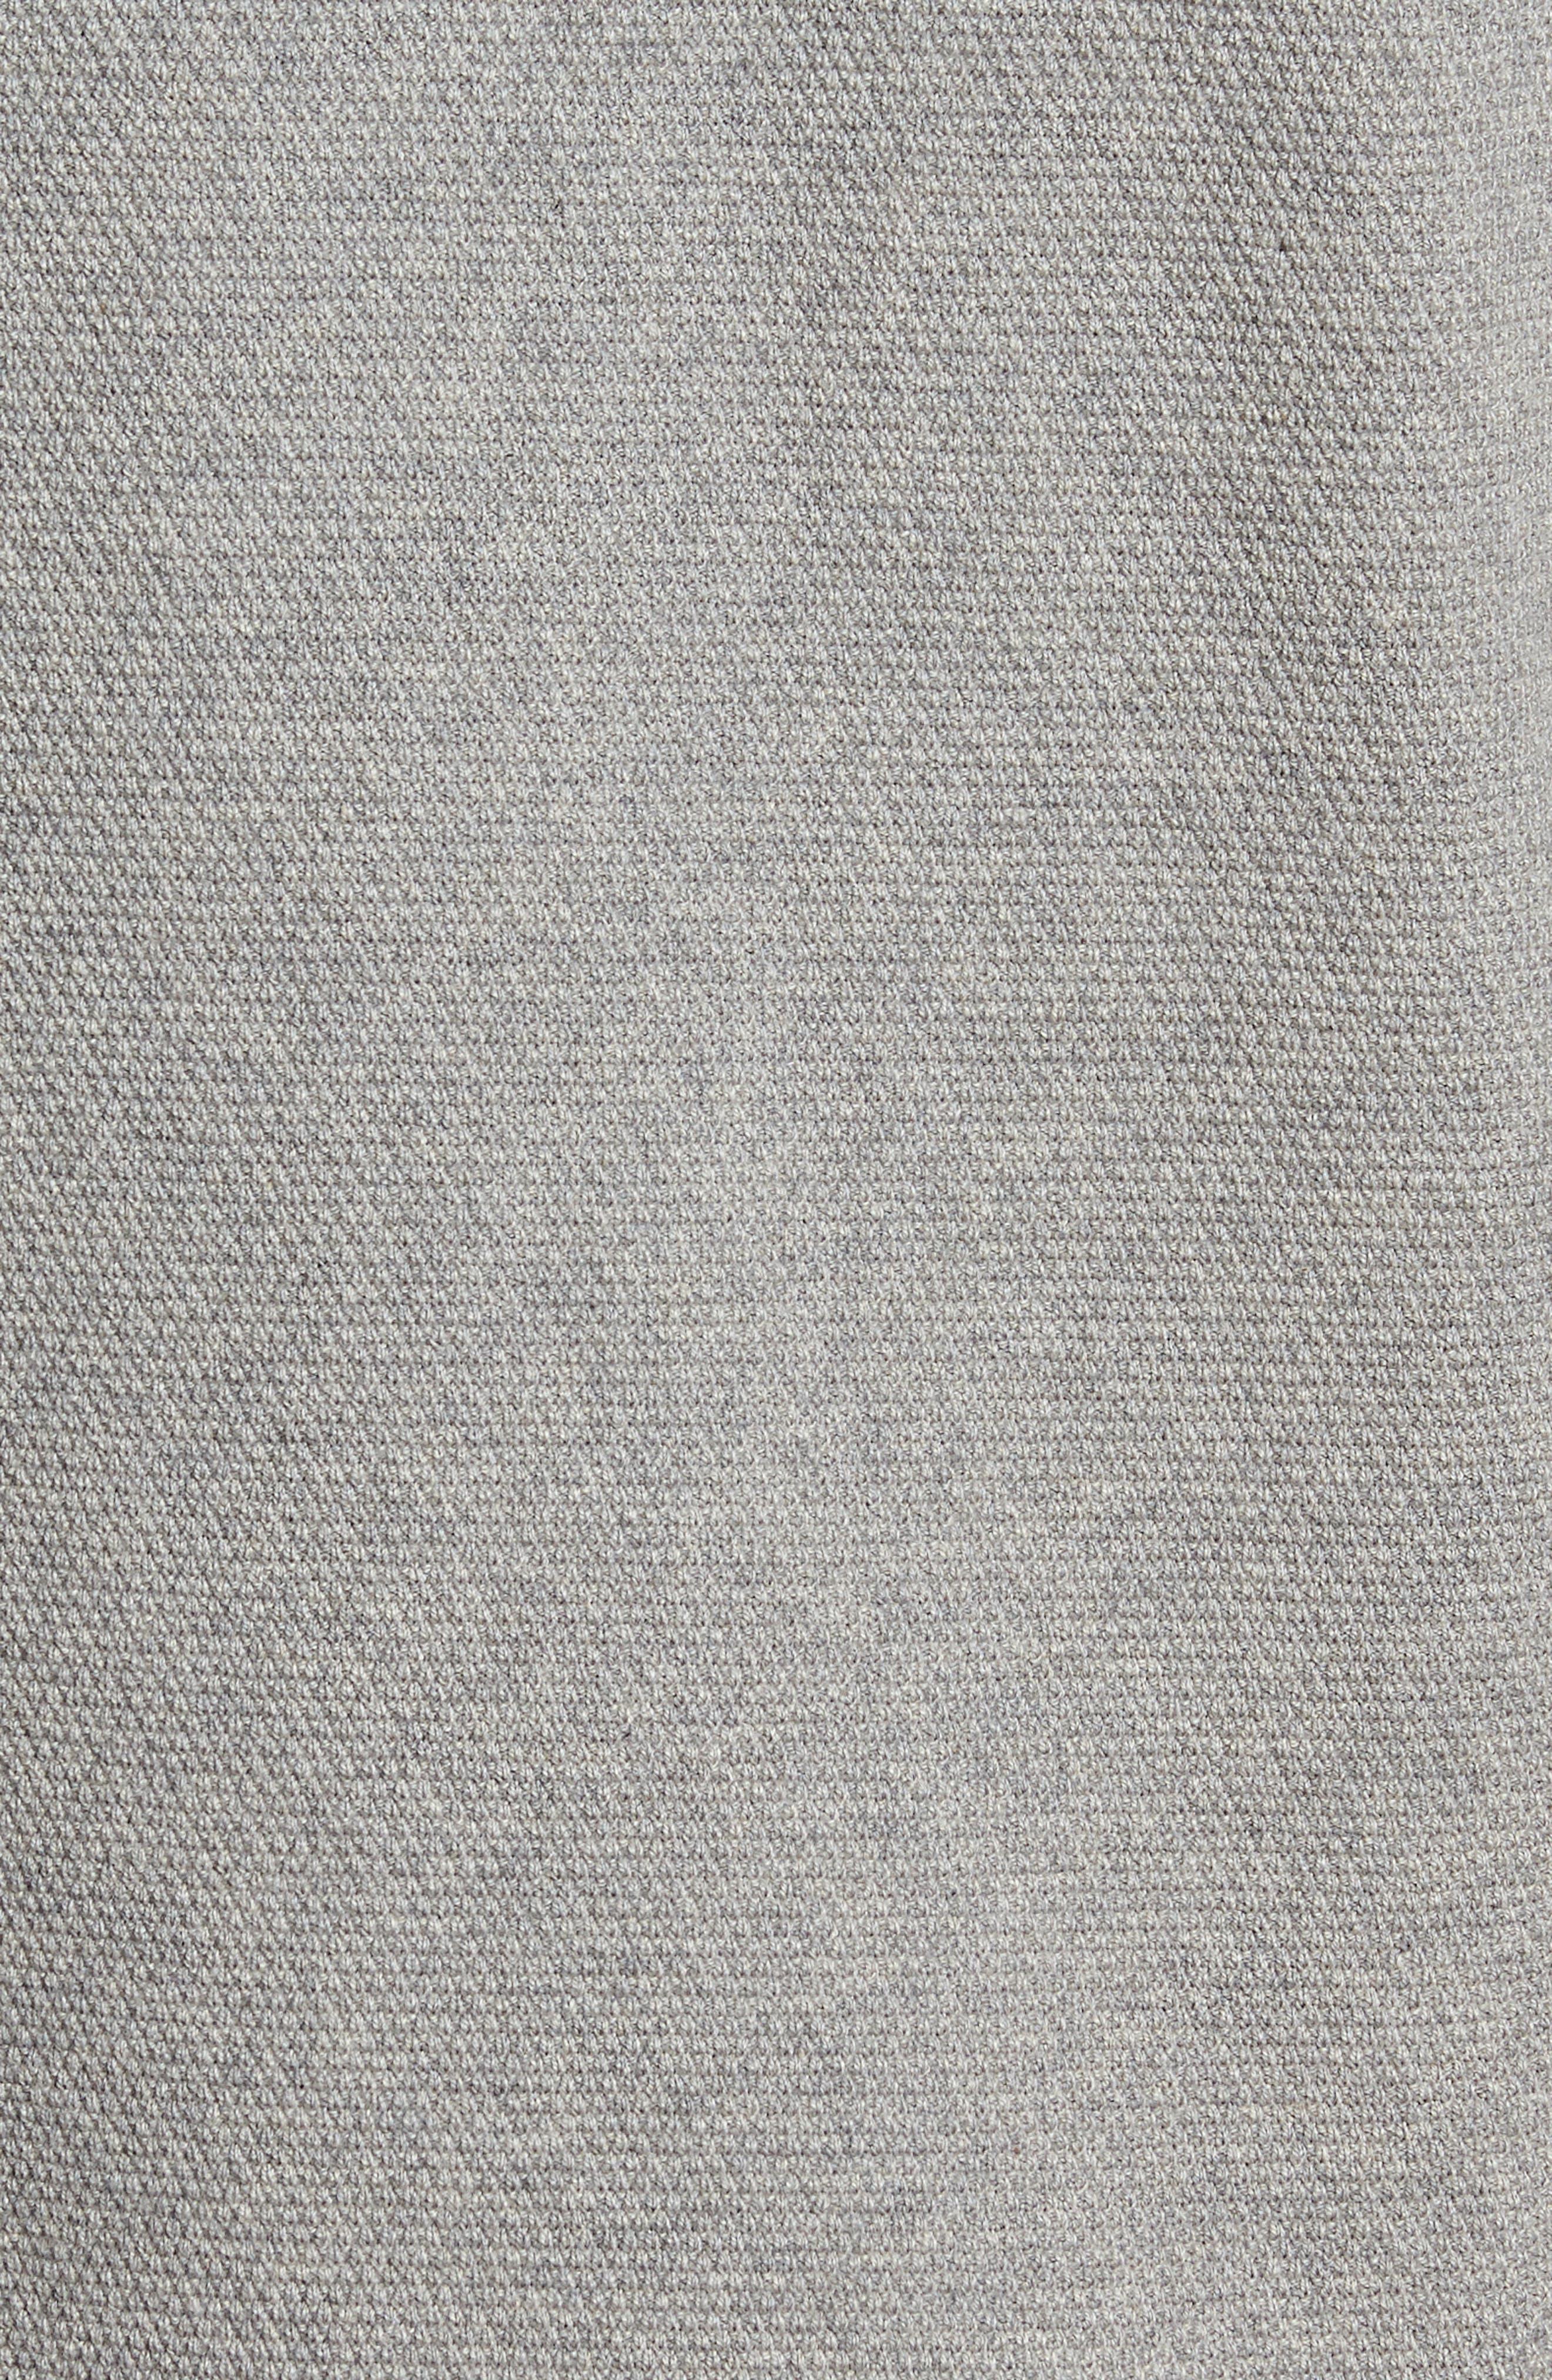 Crewneck Cotton & Cashmere Sweater,                             Alternate thumbnail 5, color,                             Grey Medium Heather